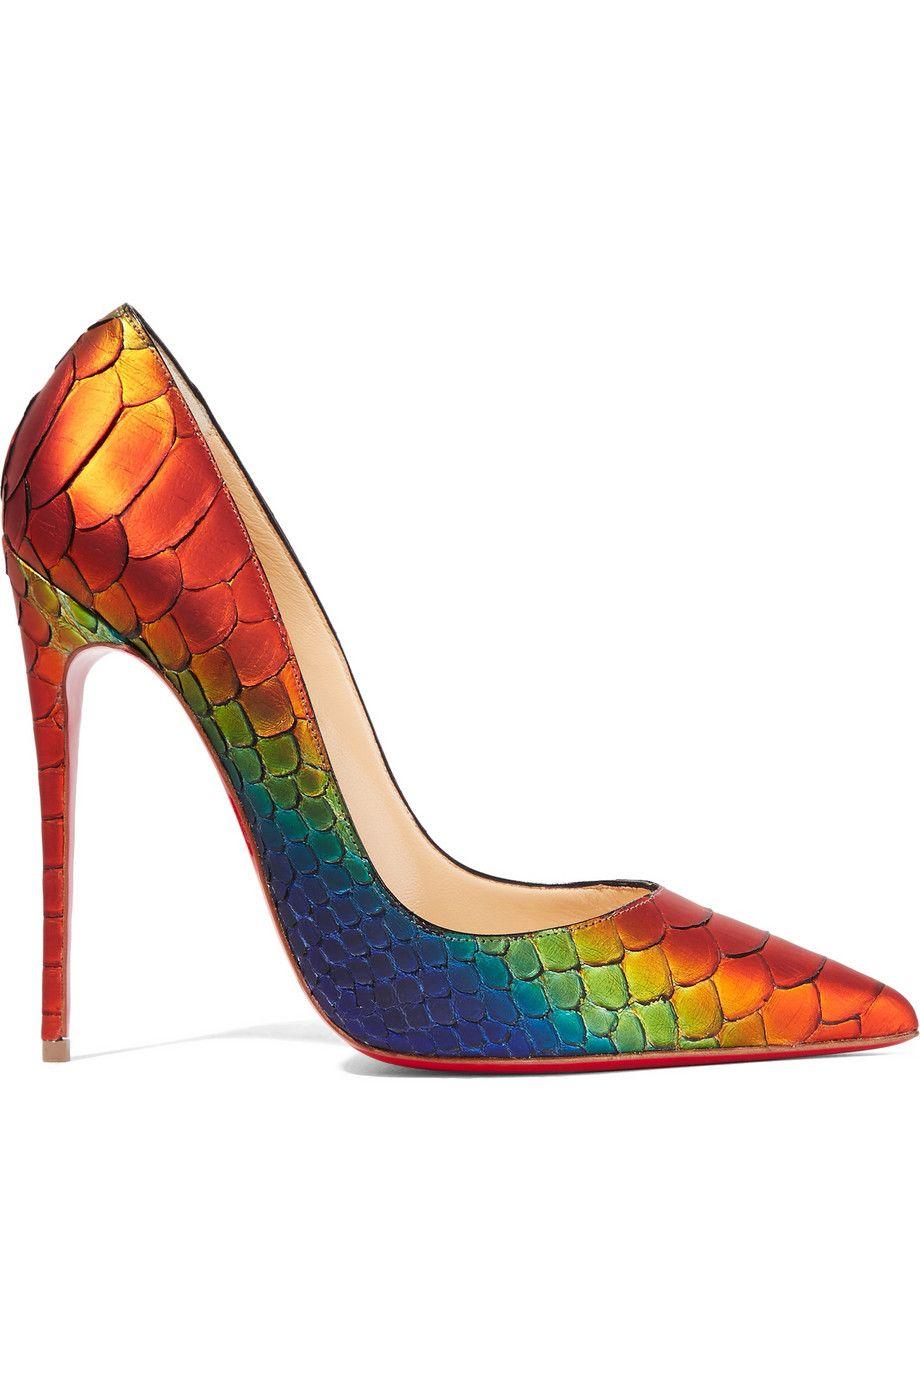 220c38105bf Christian Louboutin - So Kate 120 python pumps | Hello Lover | Shoes ...